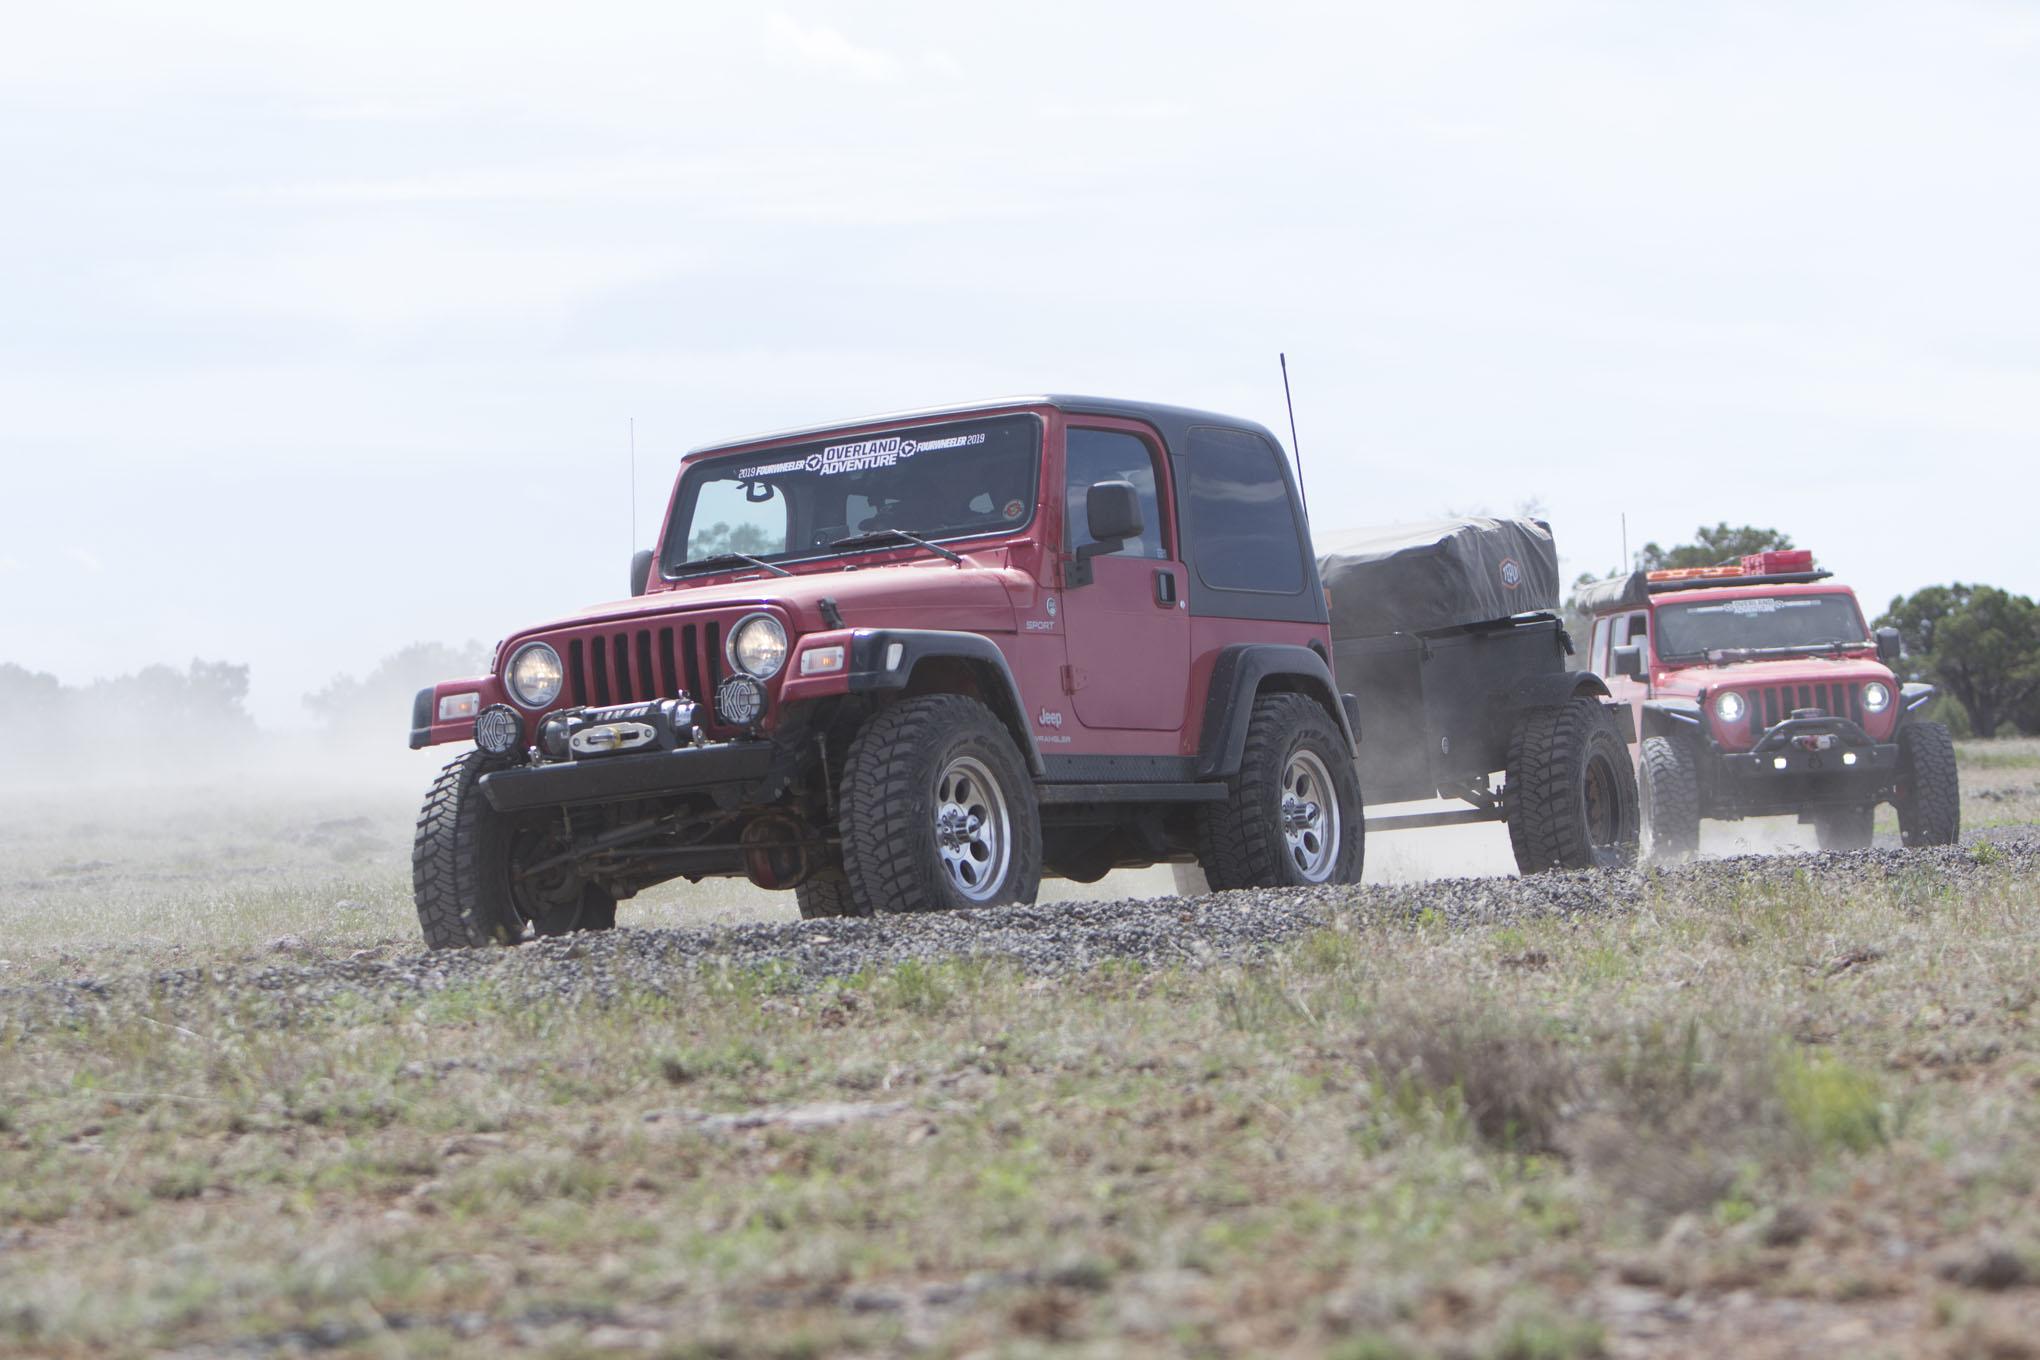 020 four wheeler aaron meyer 2006 jeep wrangler